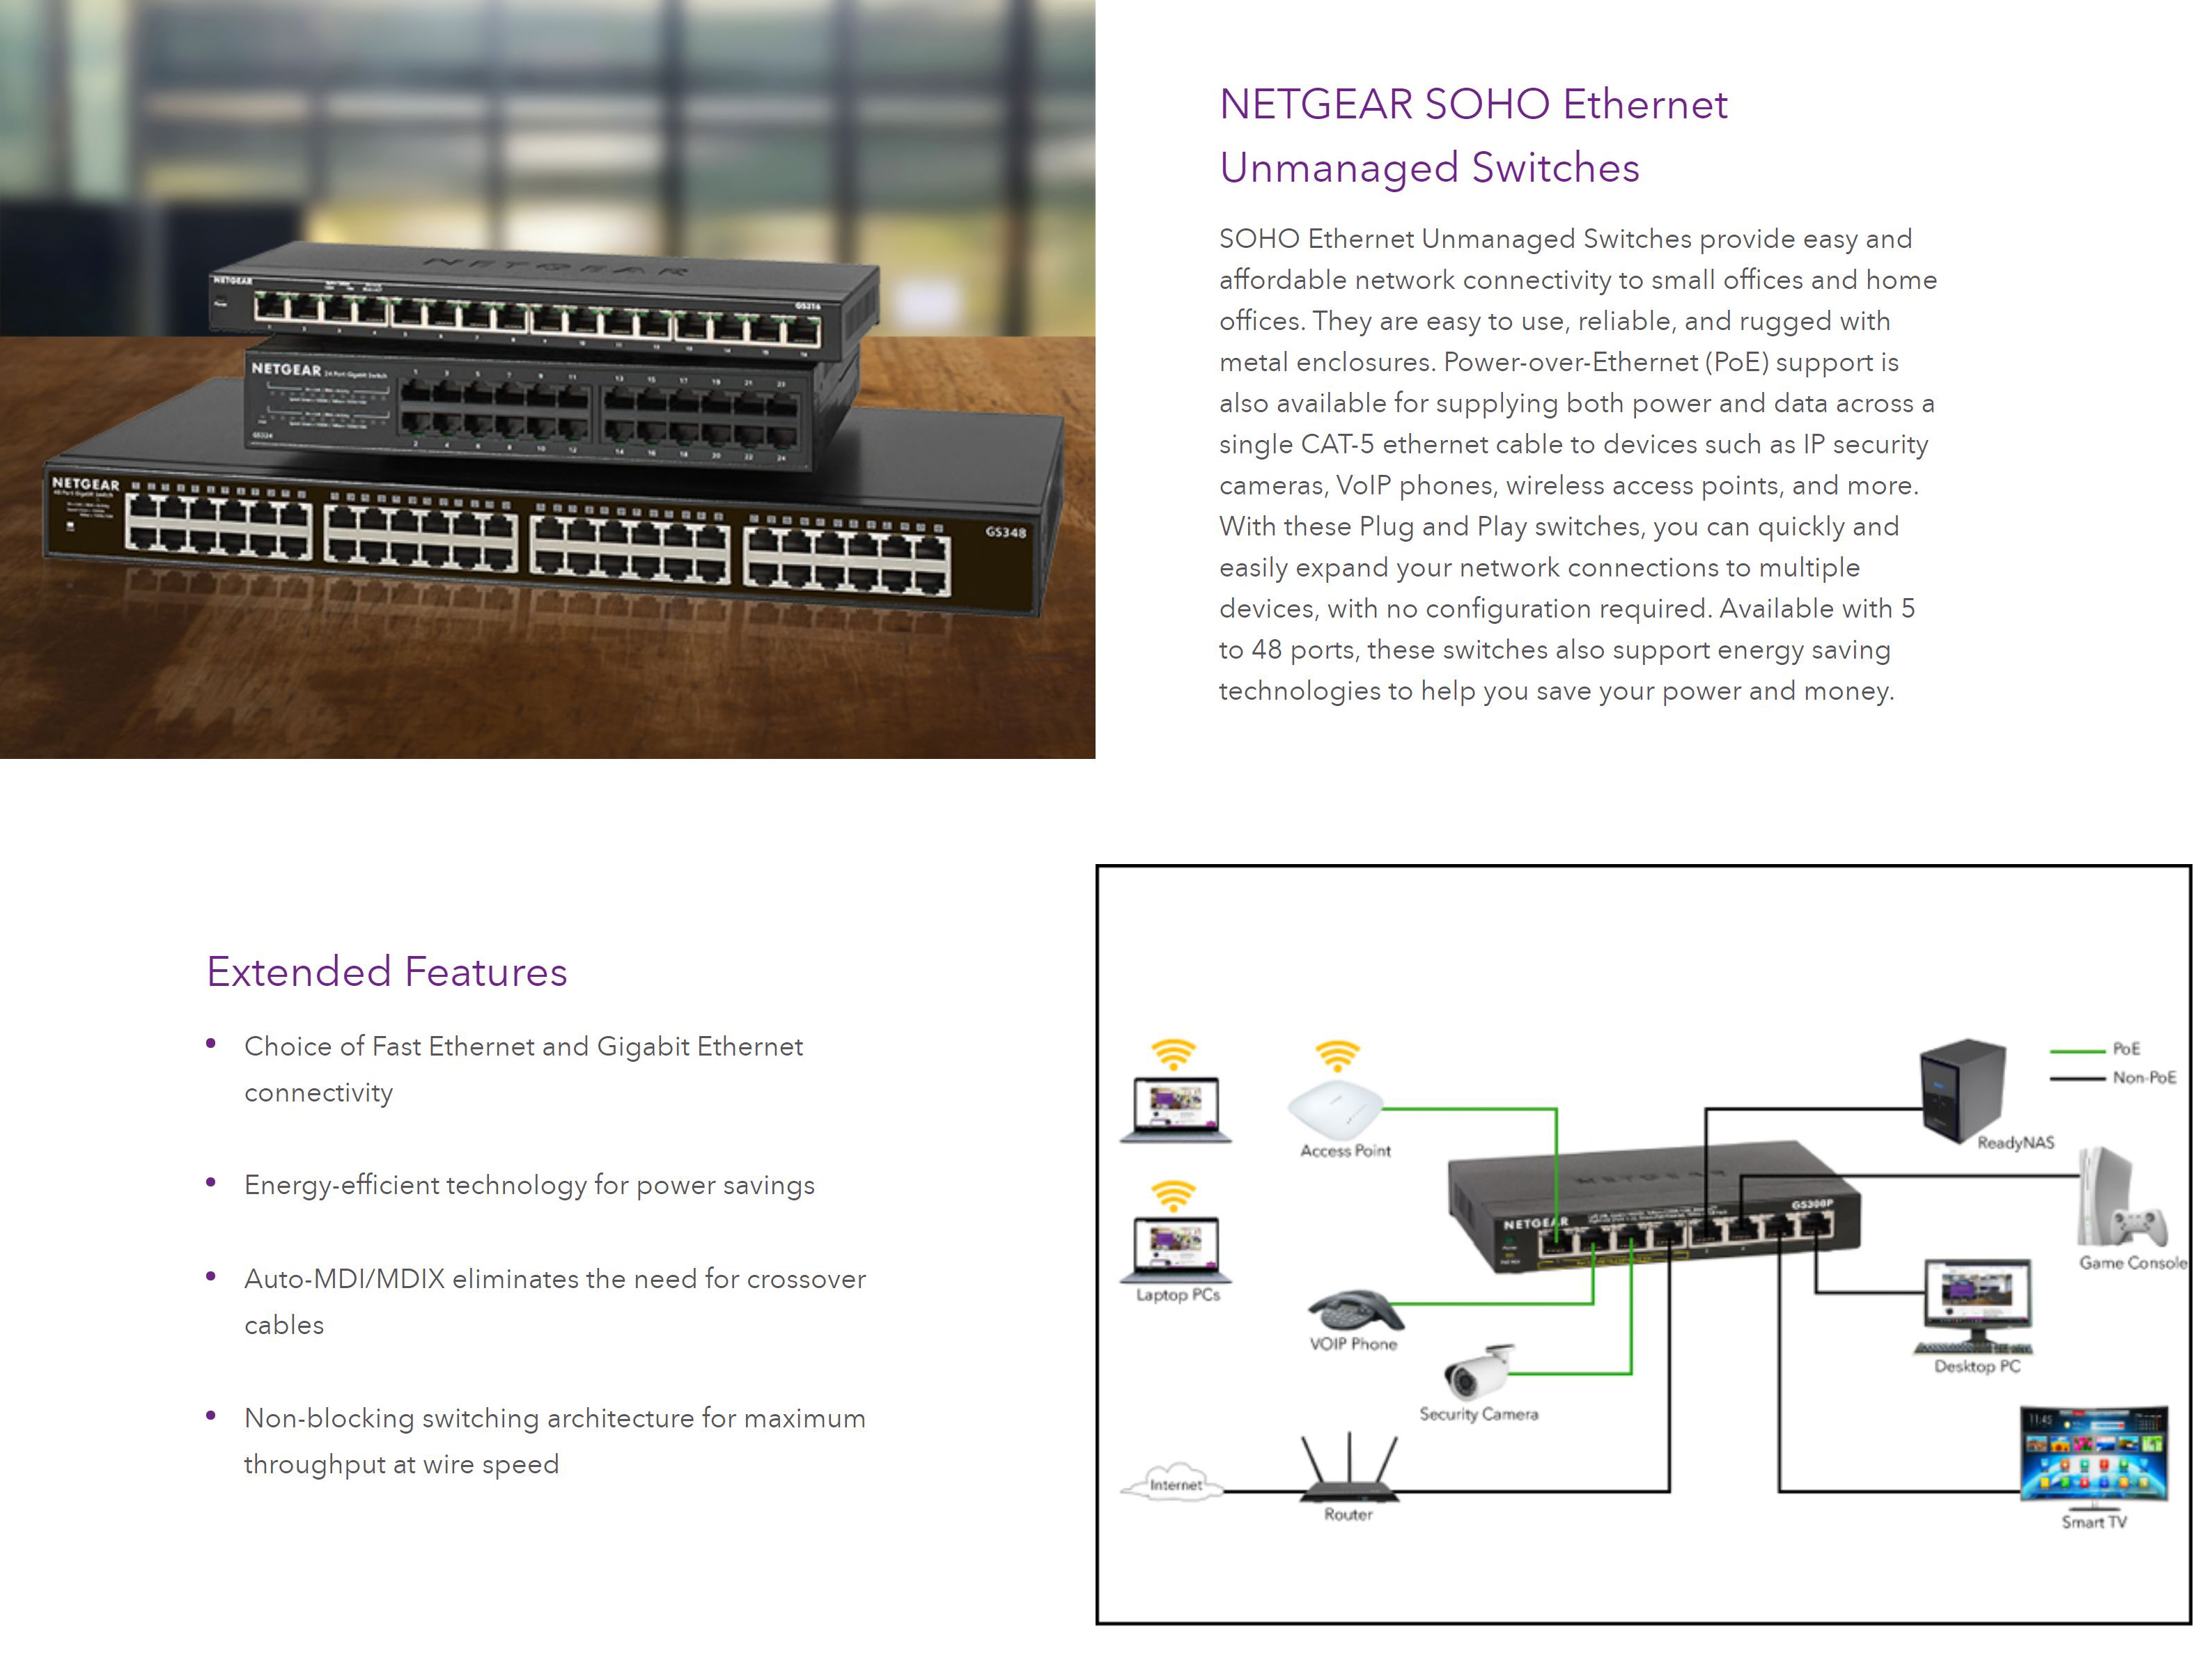 #1960 - 'GS316PP I SOHO Ethernet Unmanaged Switches I NETGEAR' - www_netgear_com_au.jpg